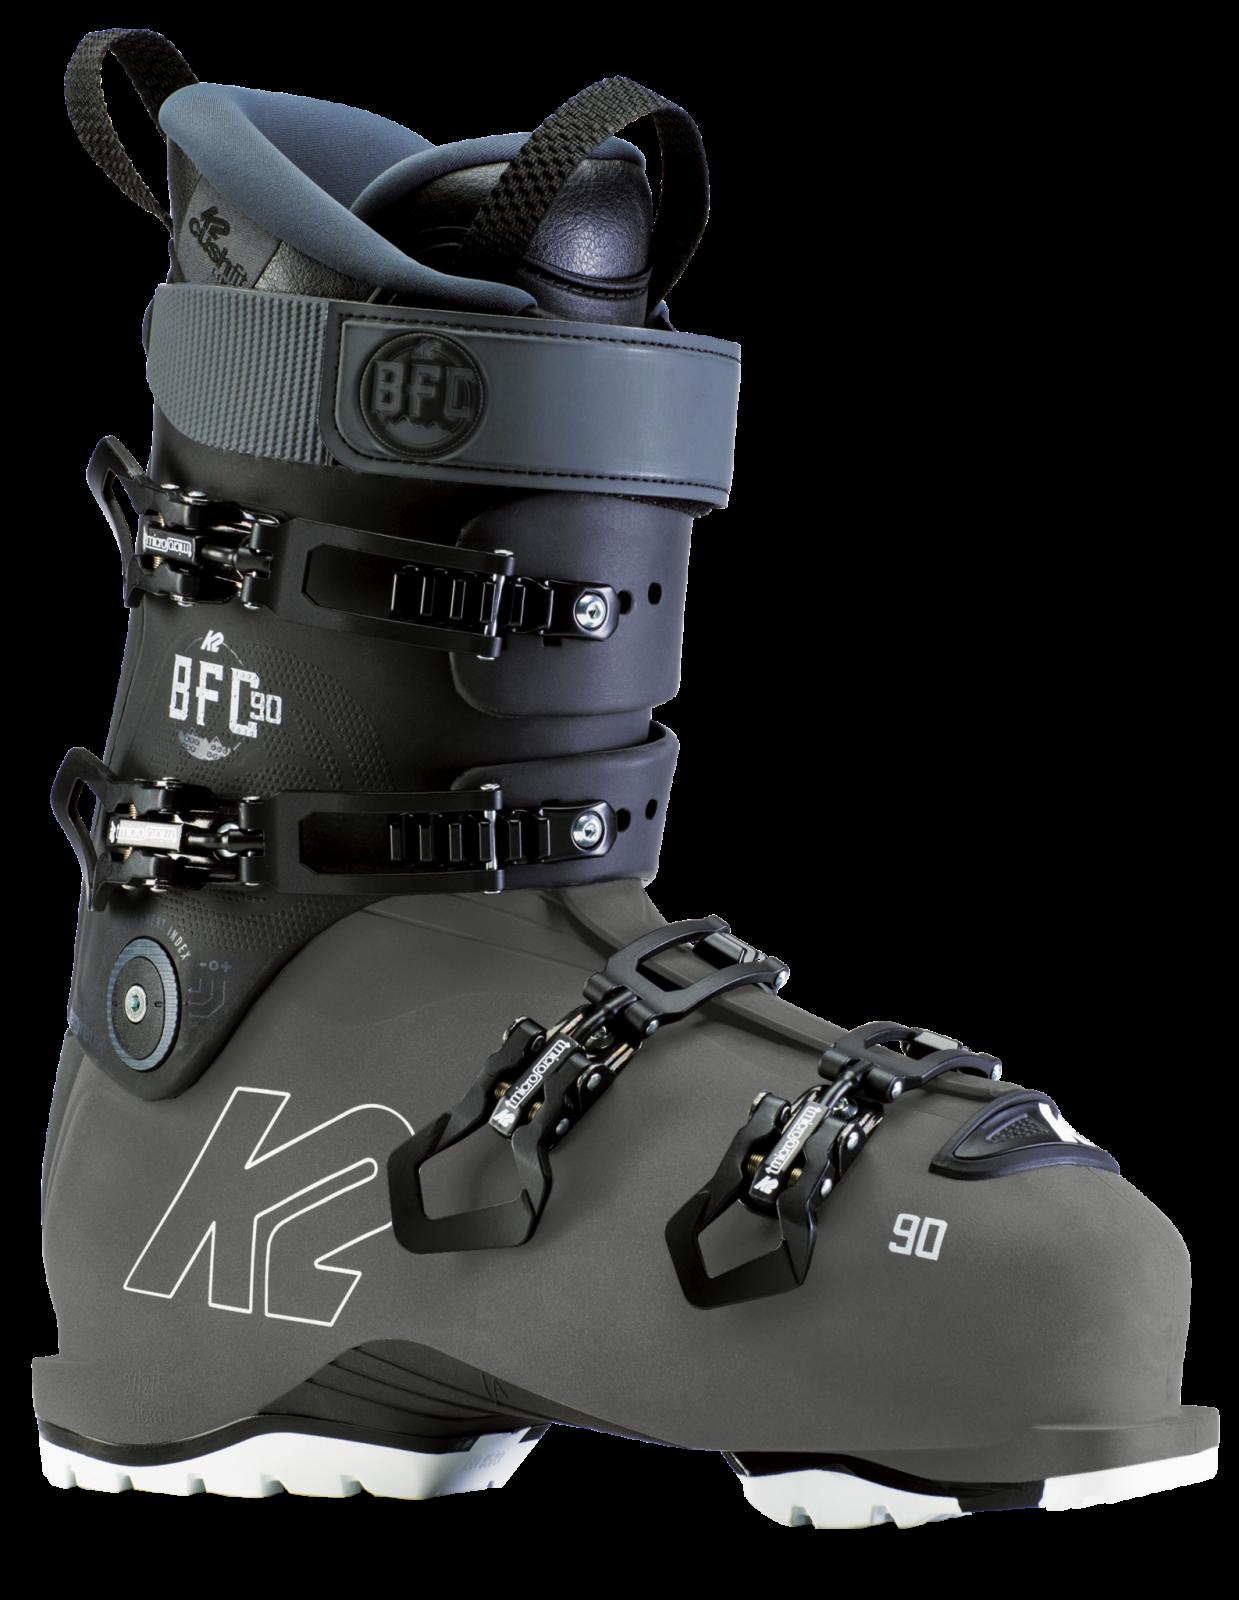 K2 BFC 90 Ski Boots 2020